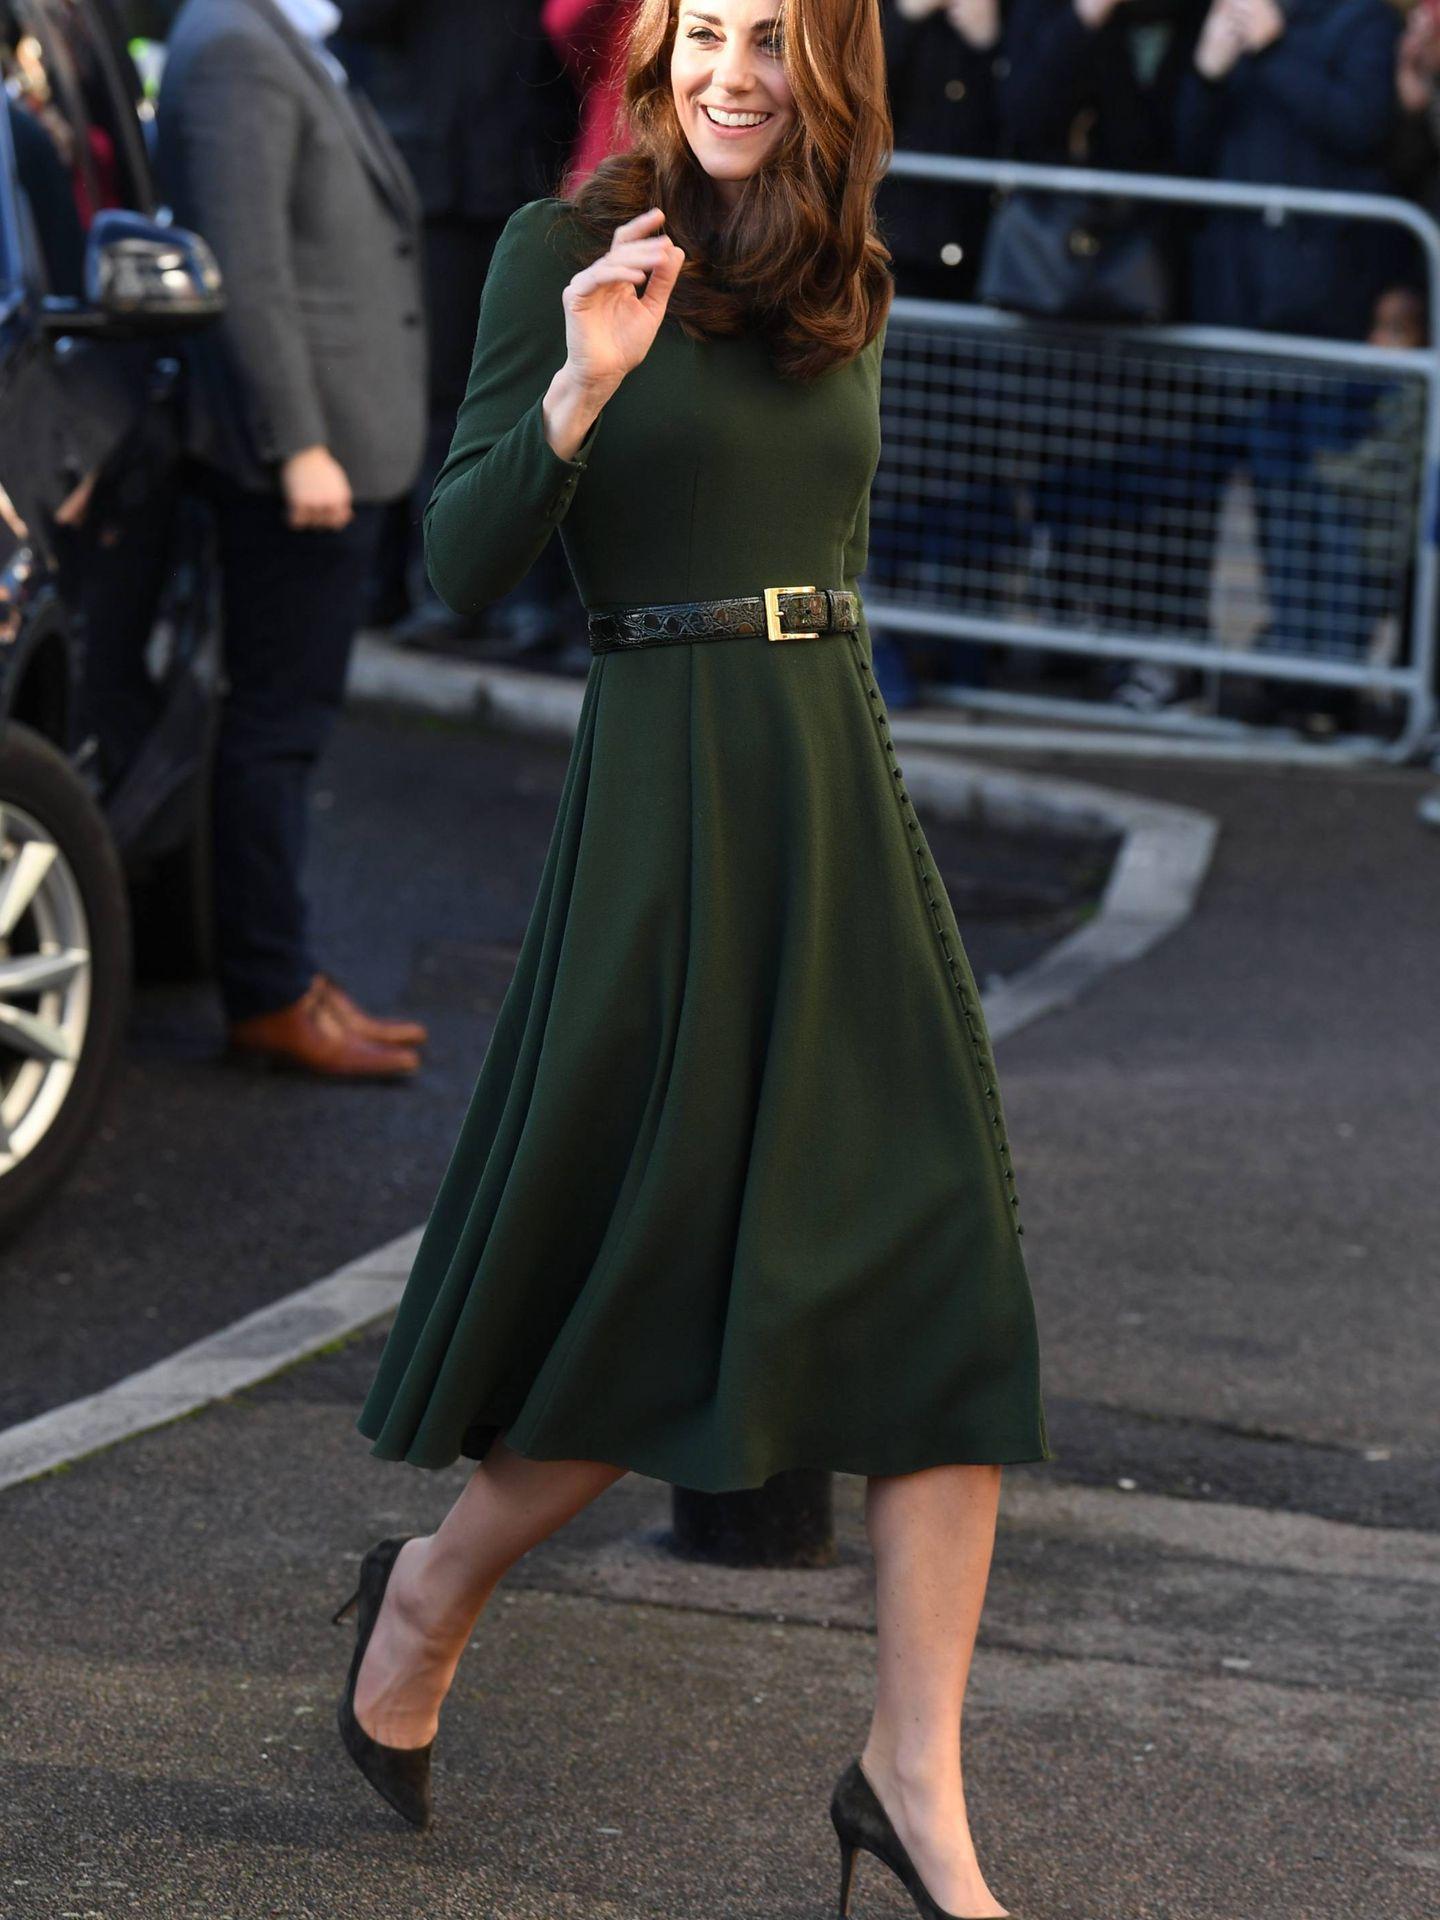 Look completo de la duquesa. (Cordon Press)